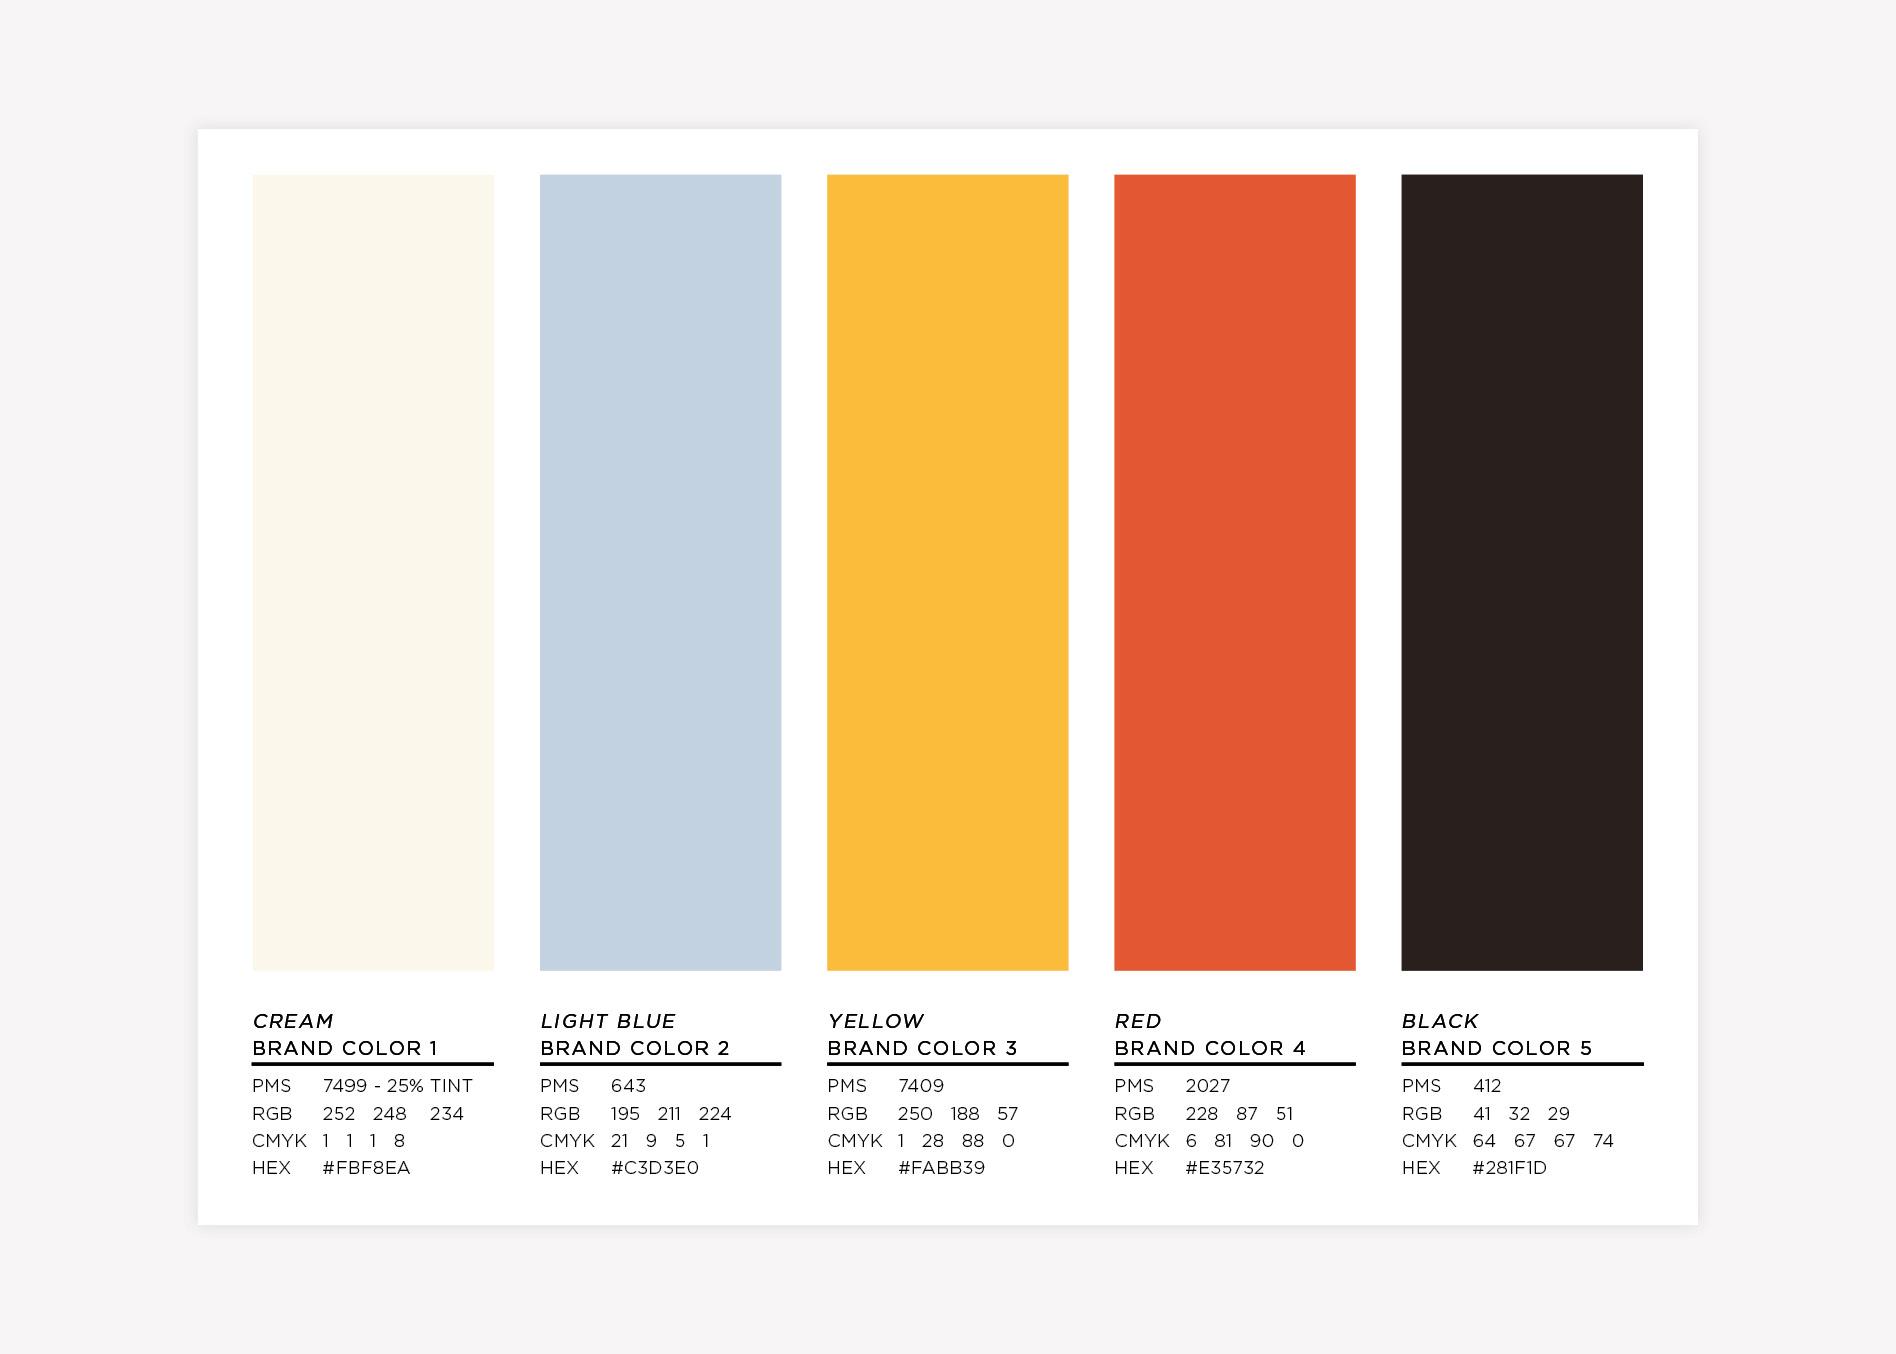 restaurant industry brand colors